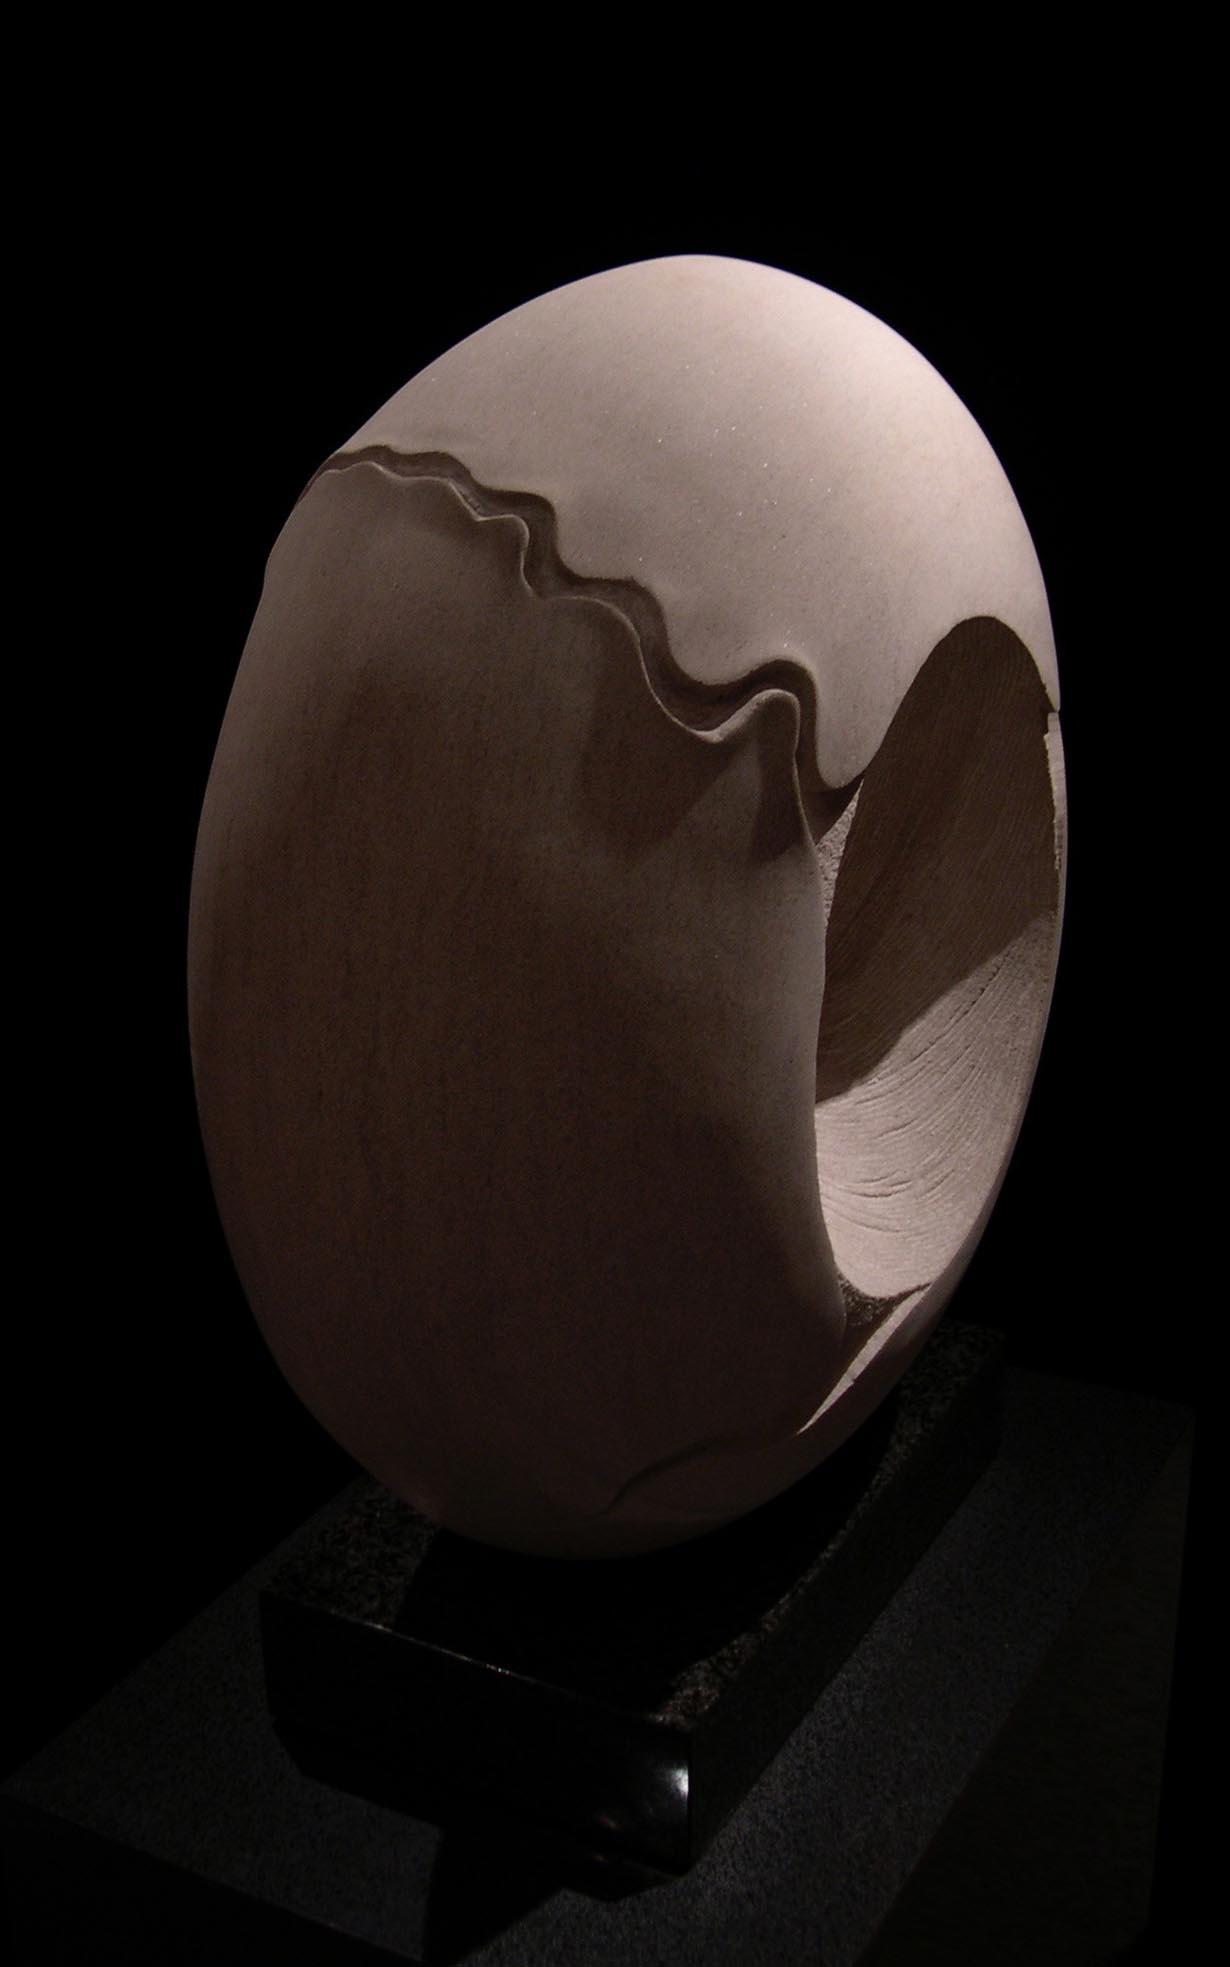 michael binkley sculptor stone sculpture artist abstract vortex statue vancouver canada